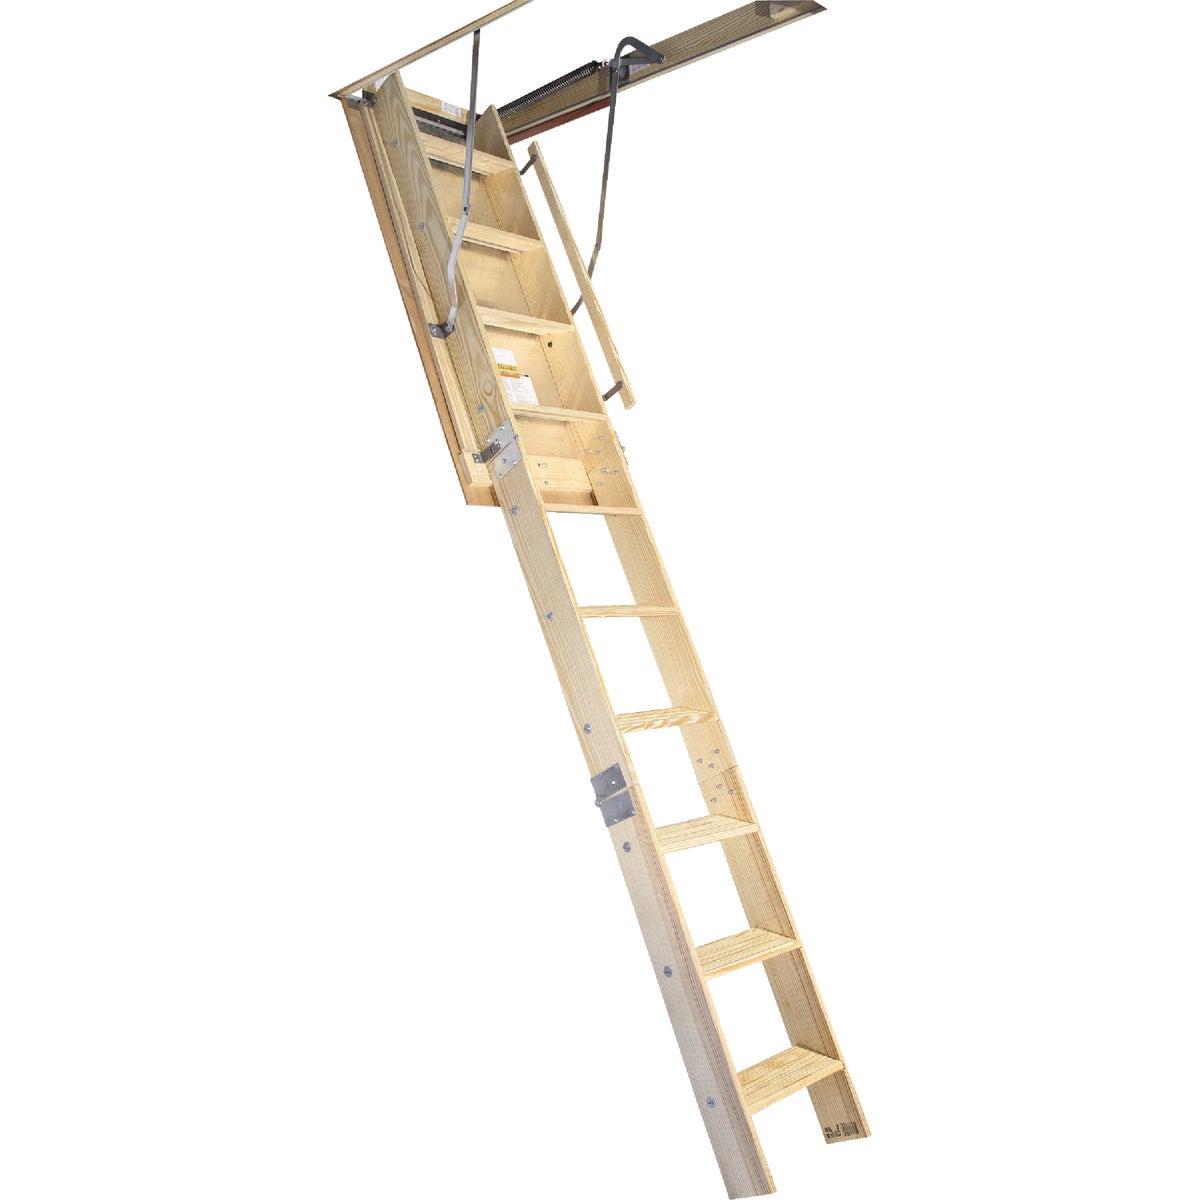 25.5X54X105 Pm Atc Stair